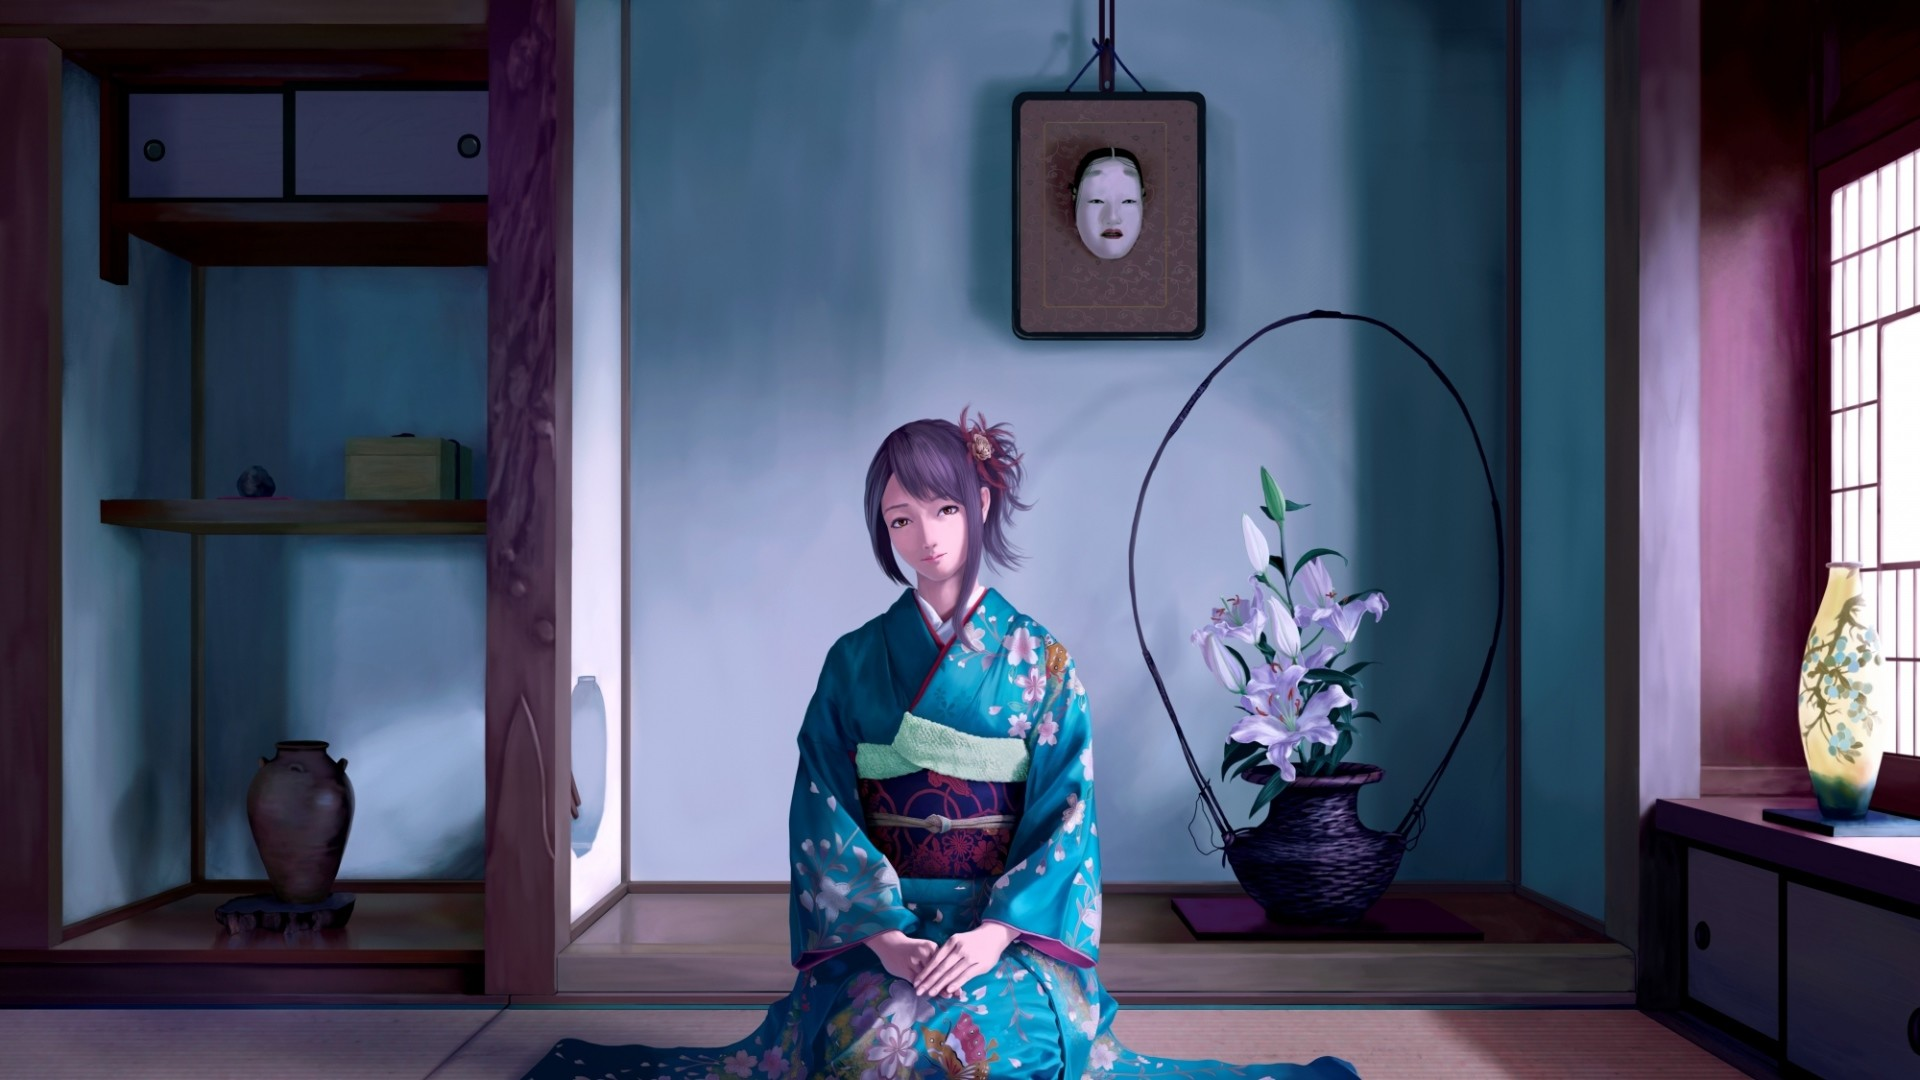 Res: 1920x1080, Download now full hd wallpaper kimono sad sight room ...